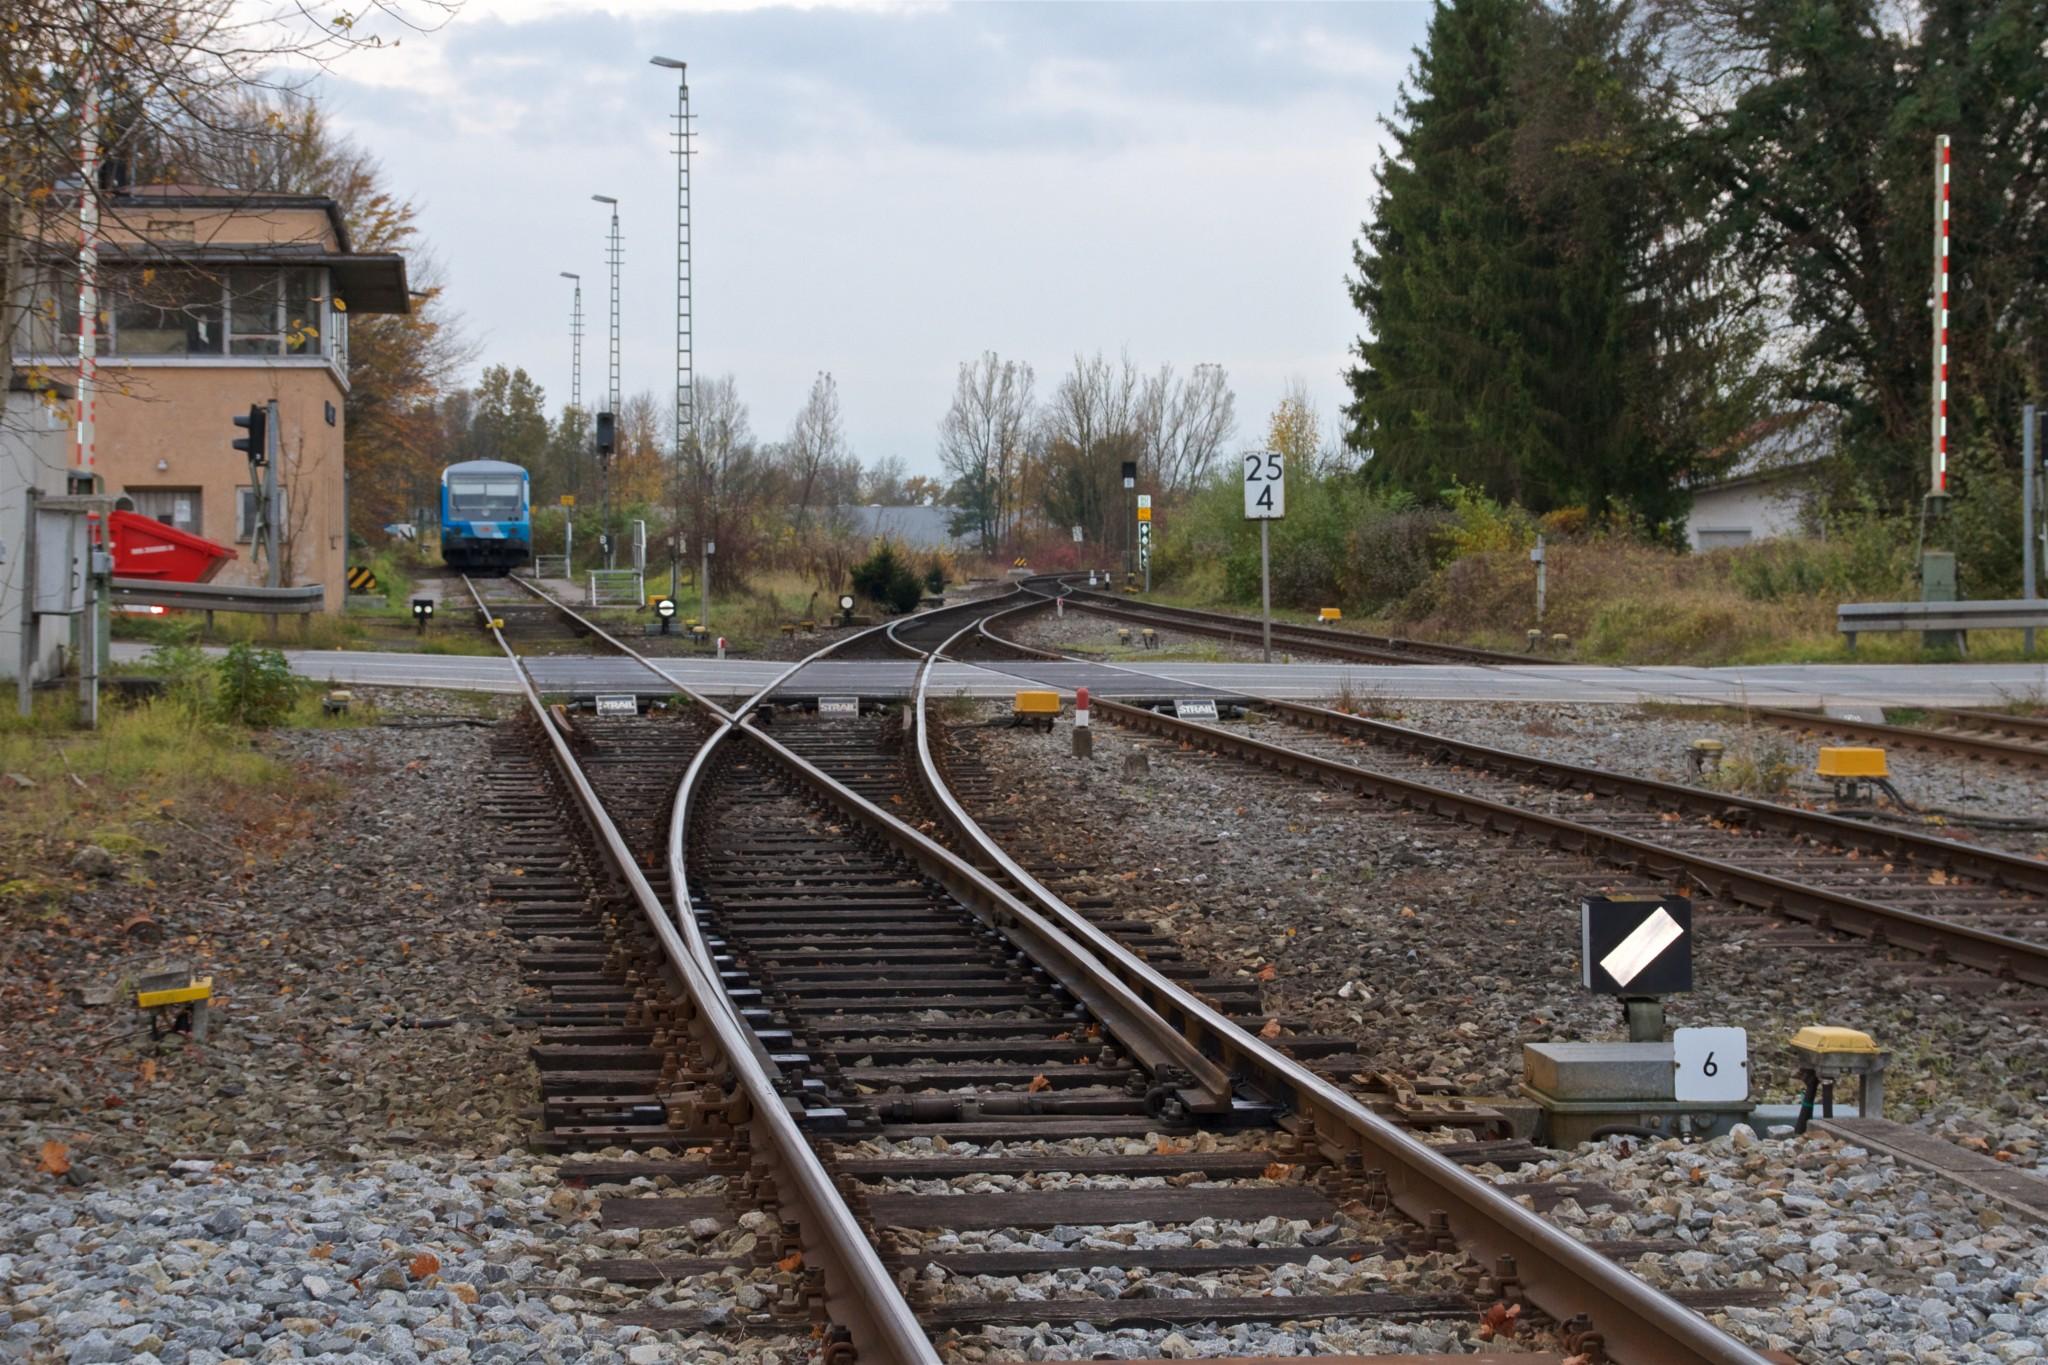 Bahnübergang in Reitmehring mit abgestelltem Filzenexpress